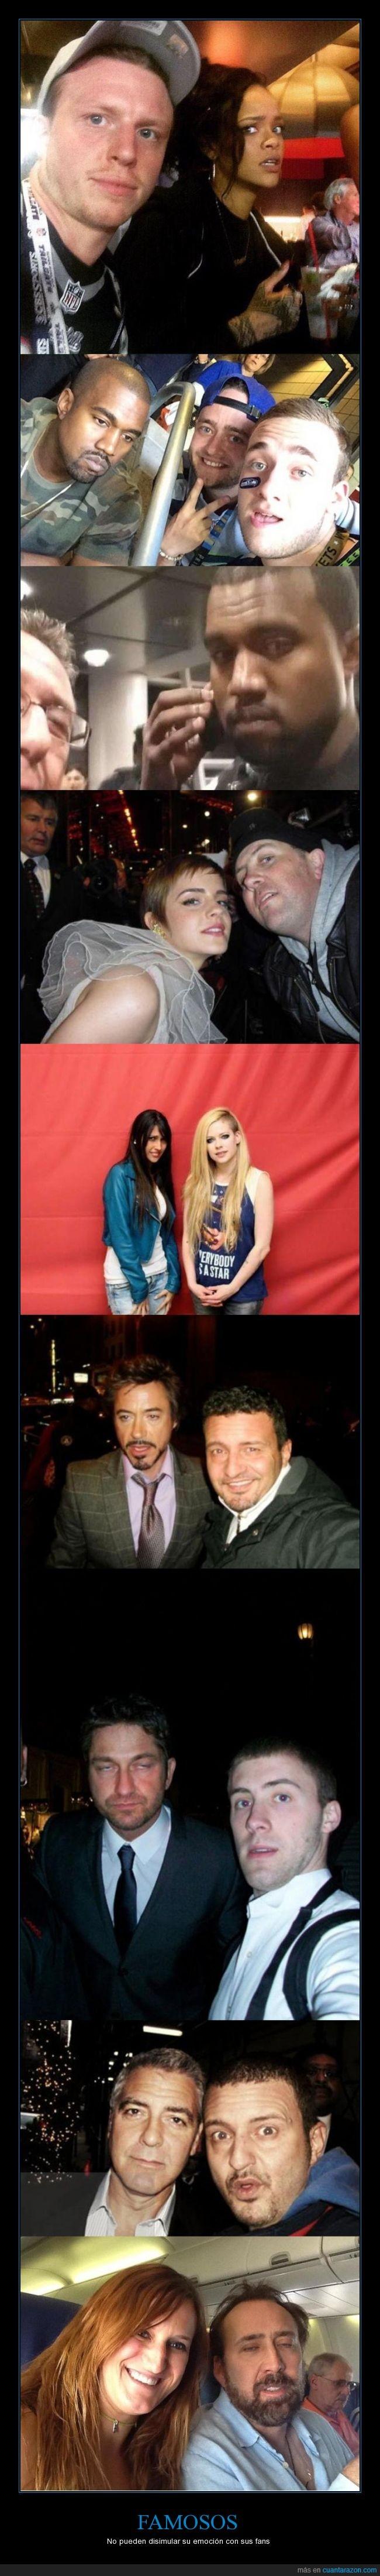 Avril Lavigne,cara,disimular,disimulo,emocion,famoso,fans,Gerard Butler,kanye,Nicolas cage,Rihanna